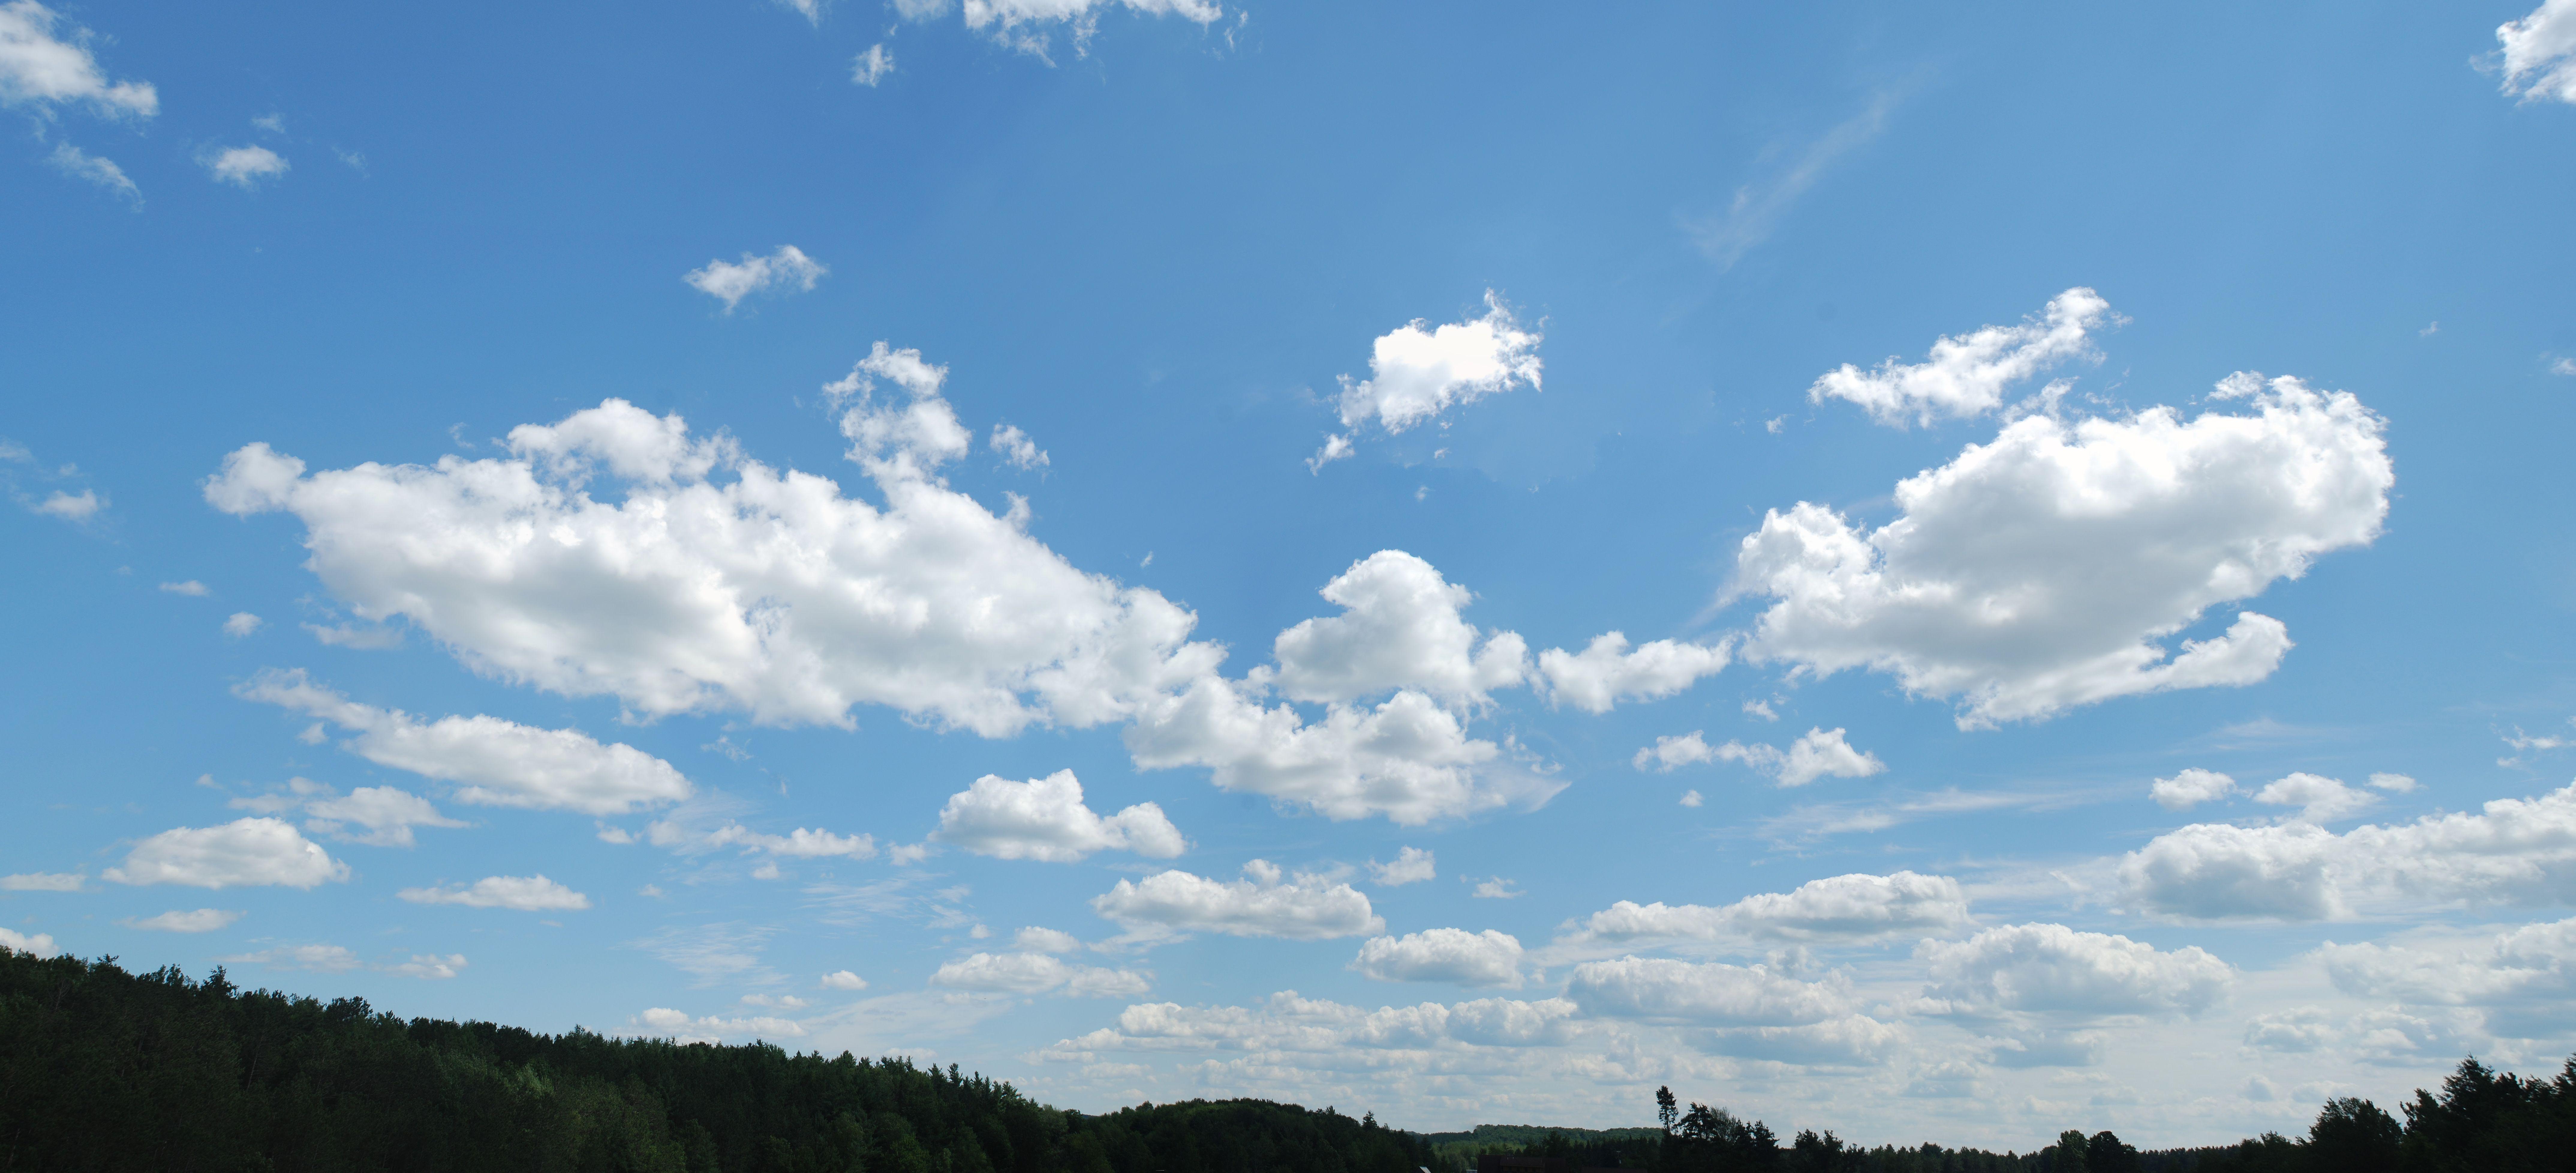 Random Things I Like The Sky Is The Limit Sky Textures Sky Images Sky Photoshop